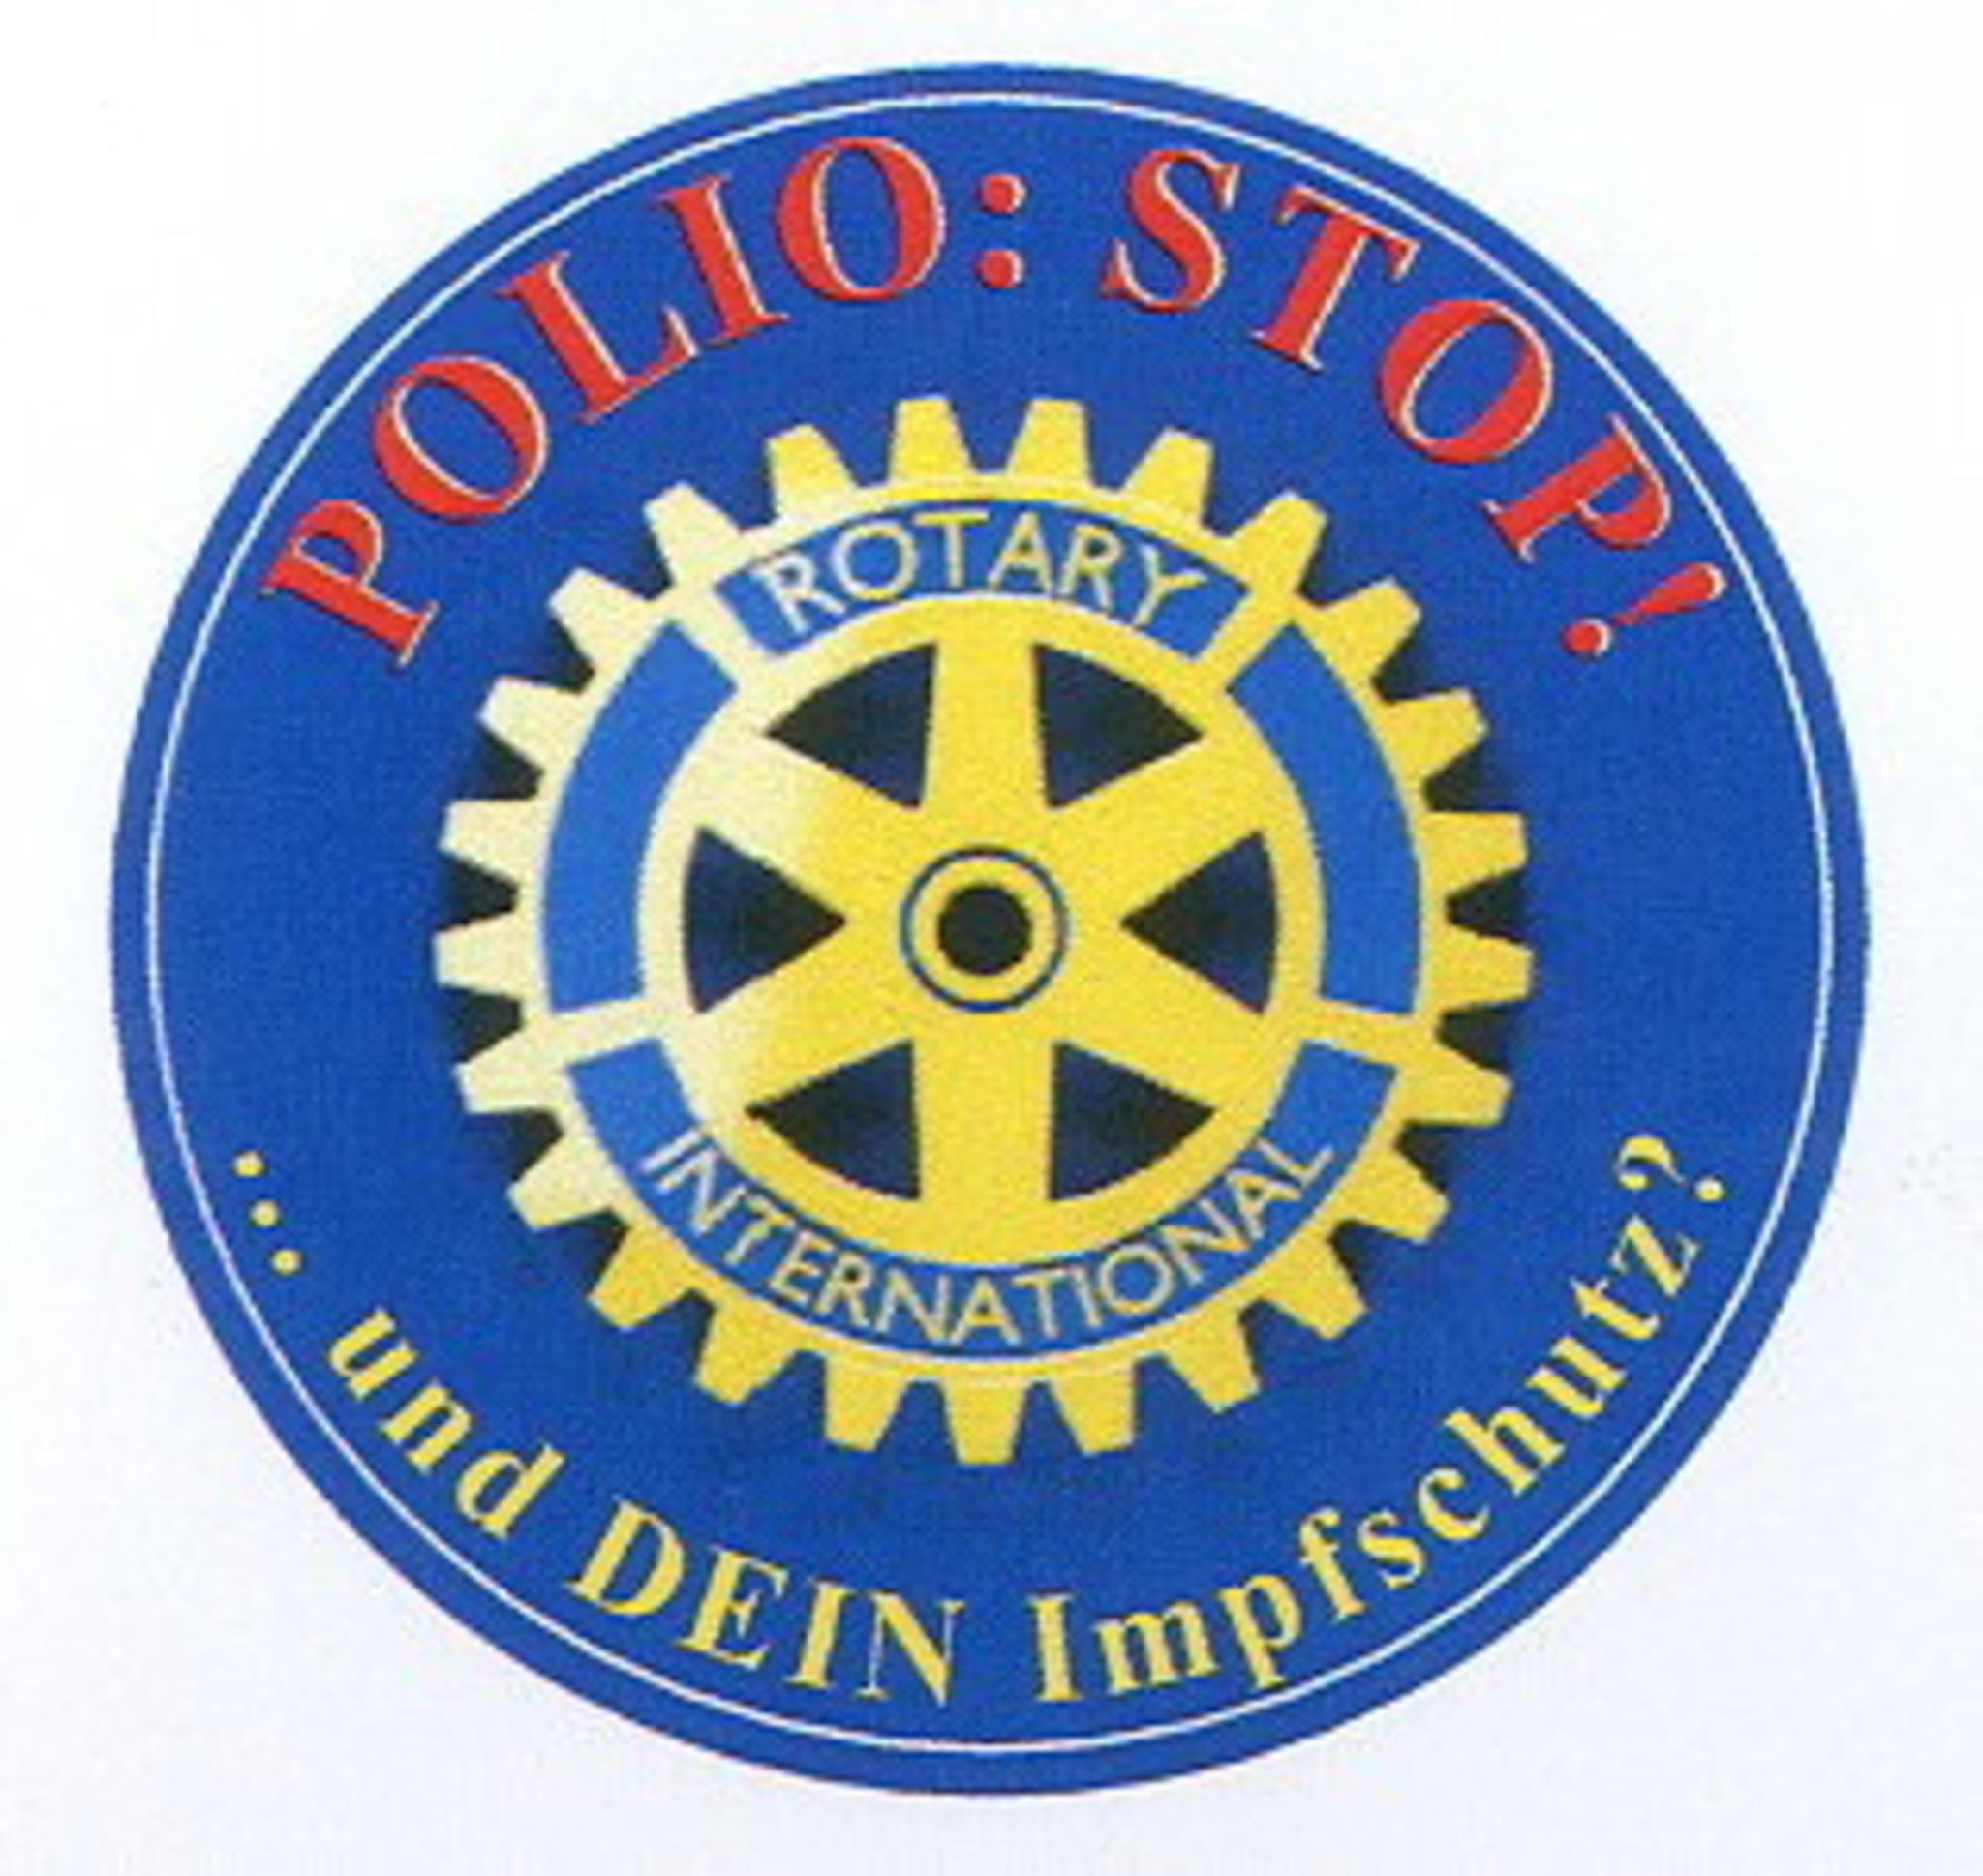 Rotary-Aktion Am 28.10. 2014 Gegen Kinderlähmung Im